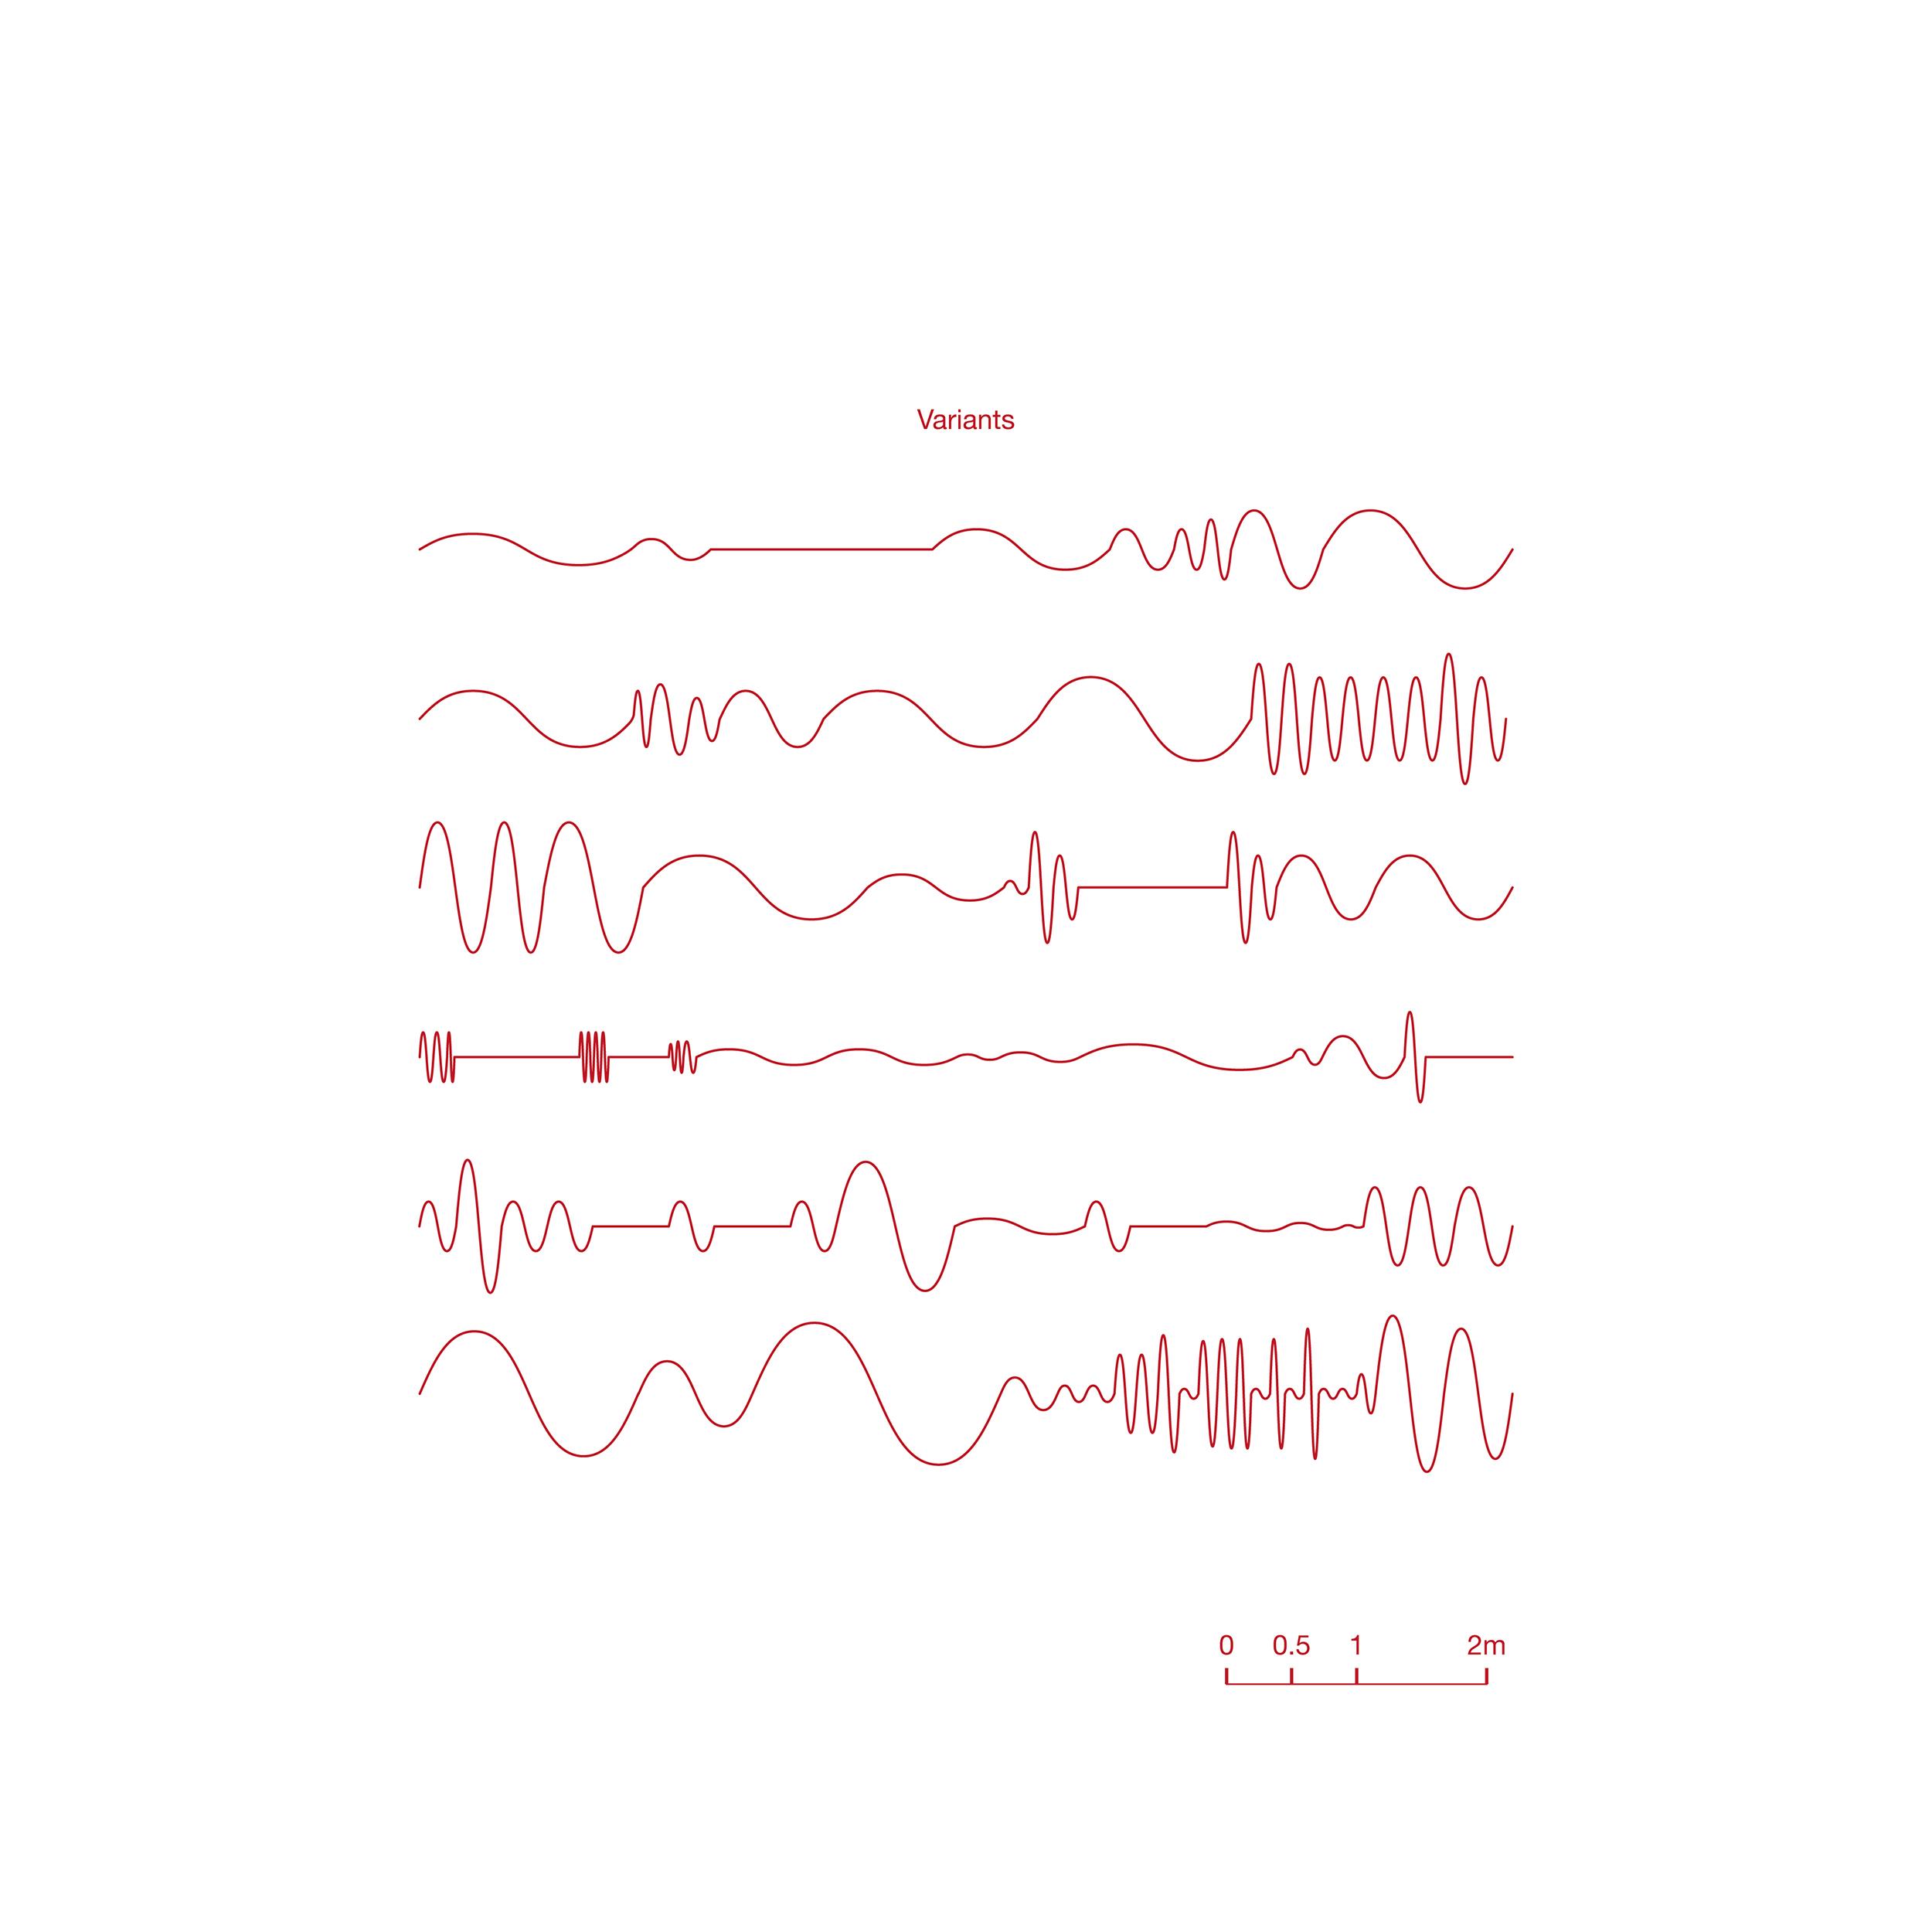 Counterpoint_Variant wavelengths.jpg